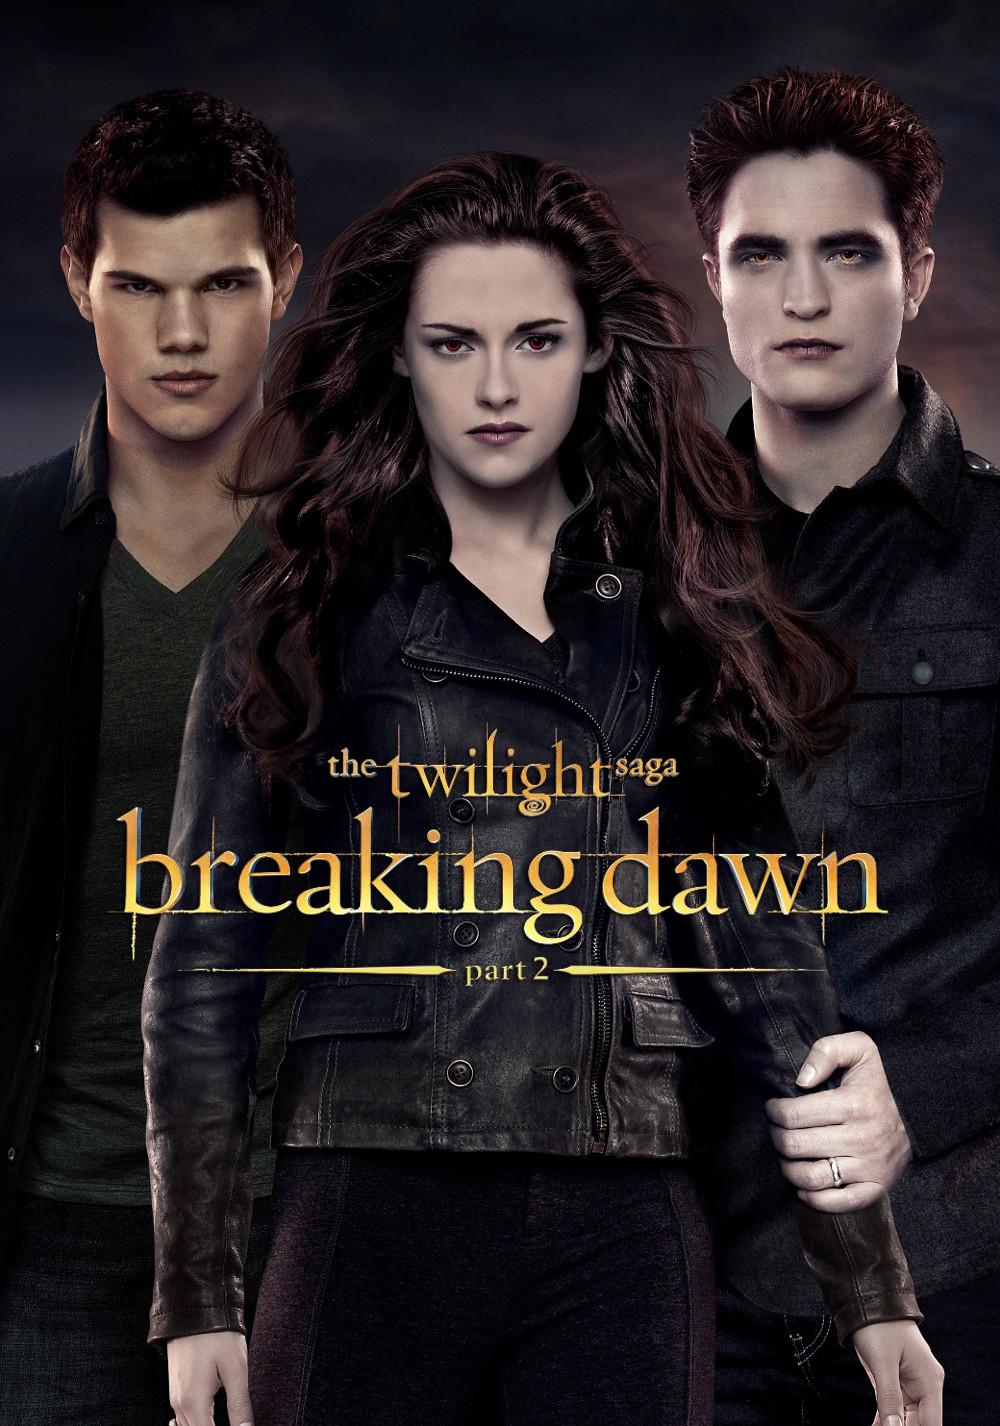 the twilight saga breaking dawn part 2 movie fanart